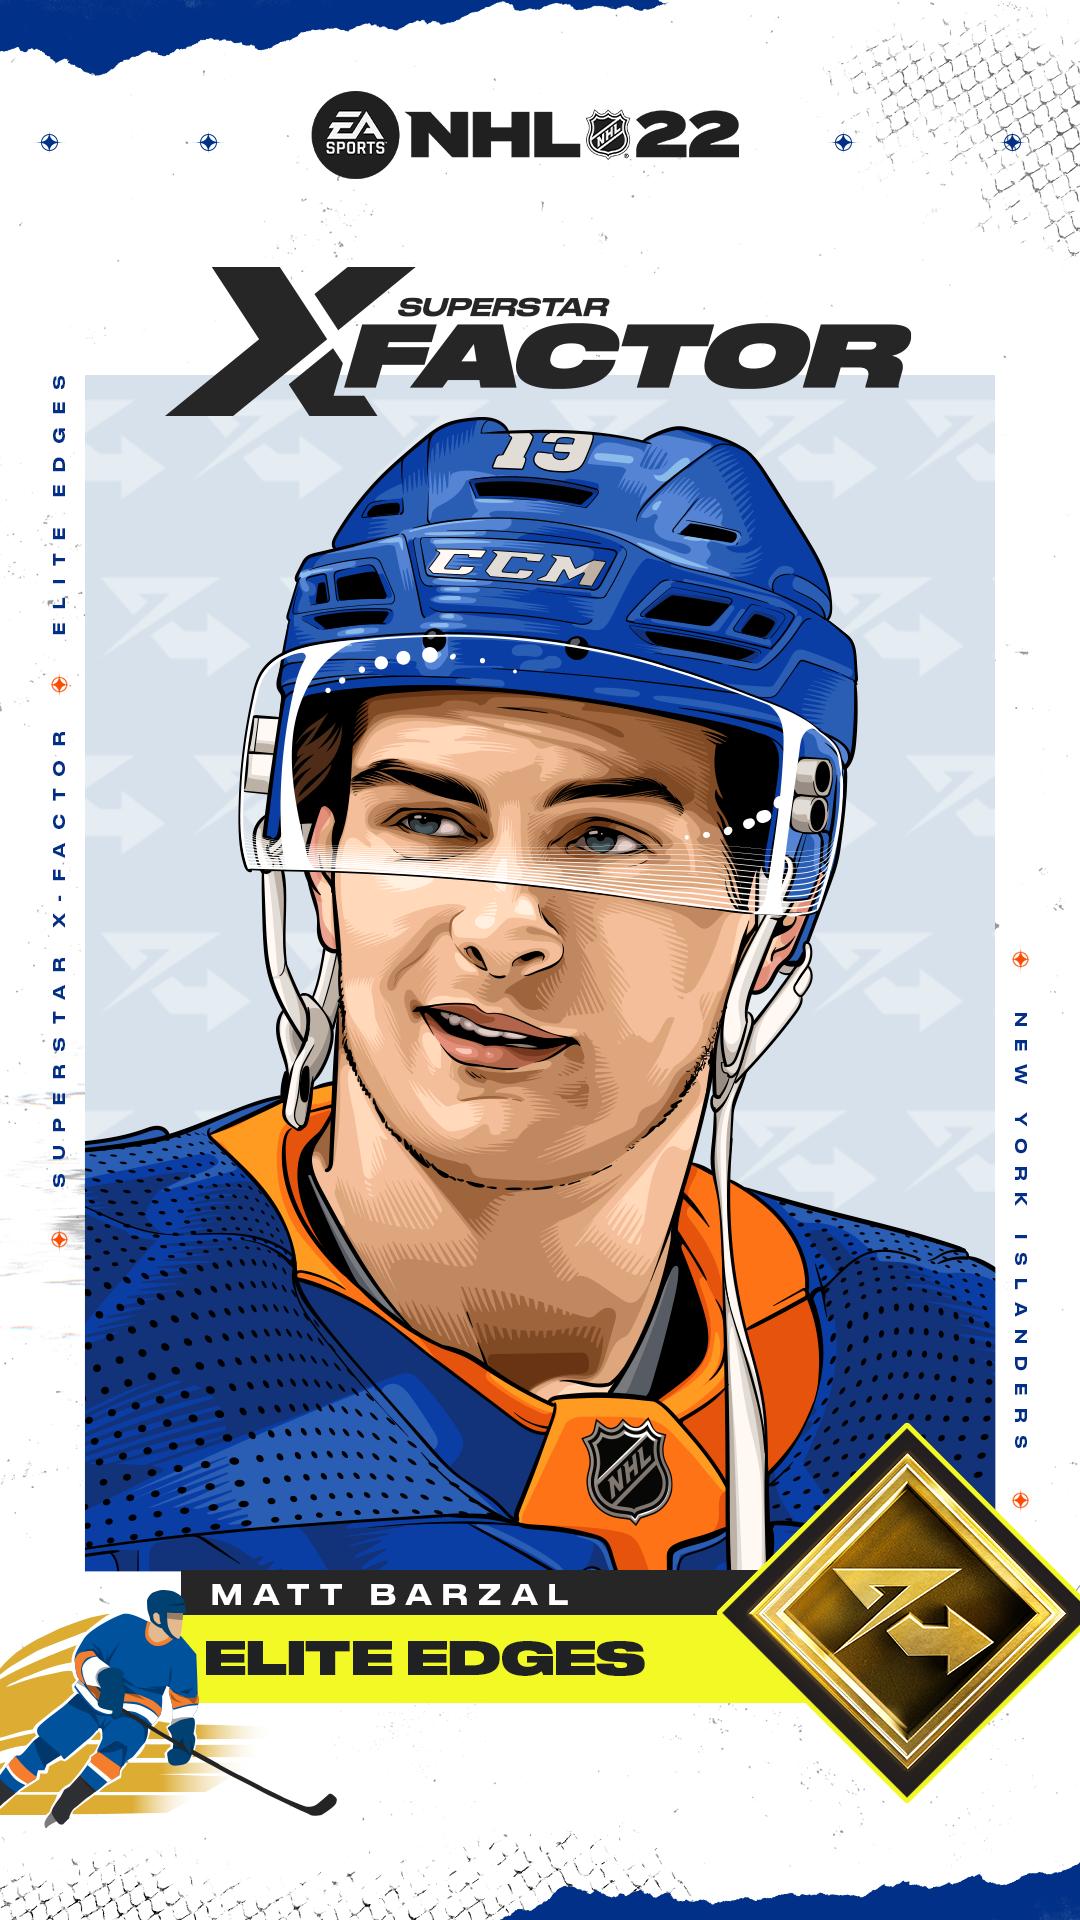 NHL22_XFactor_Matt_Barzal_9x16